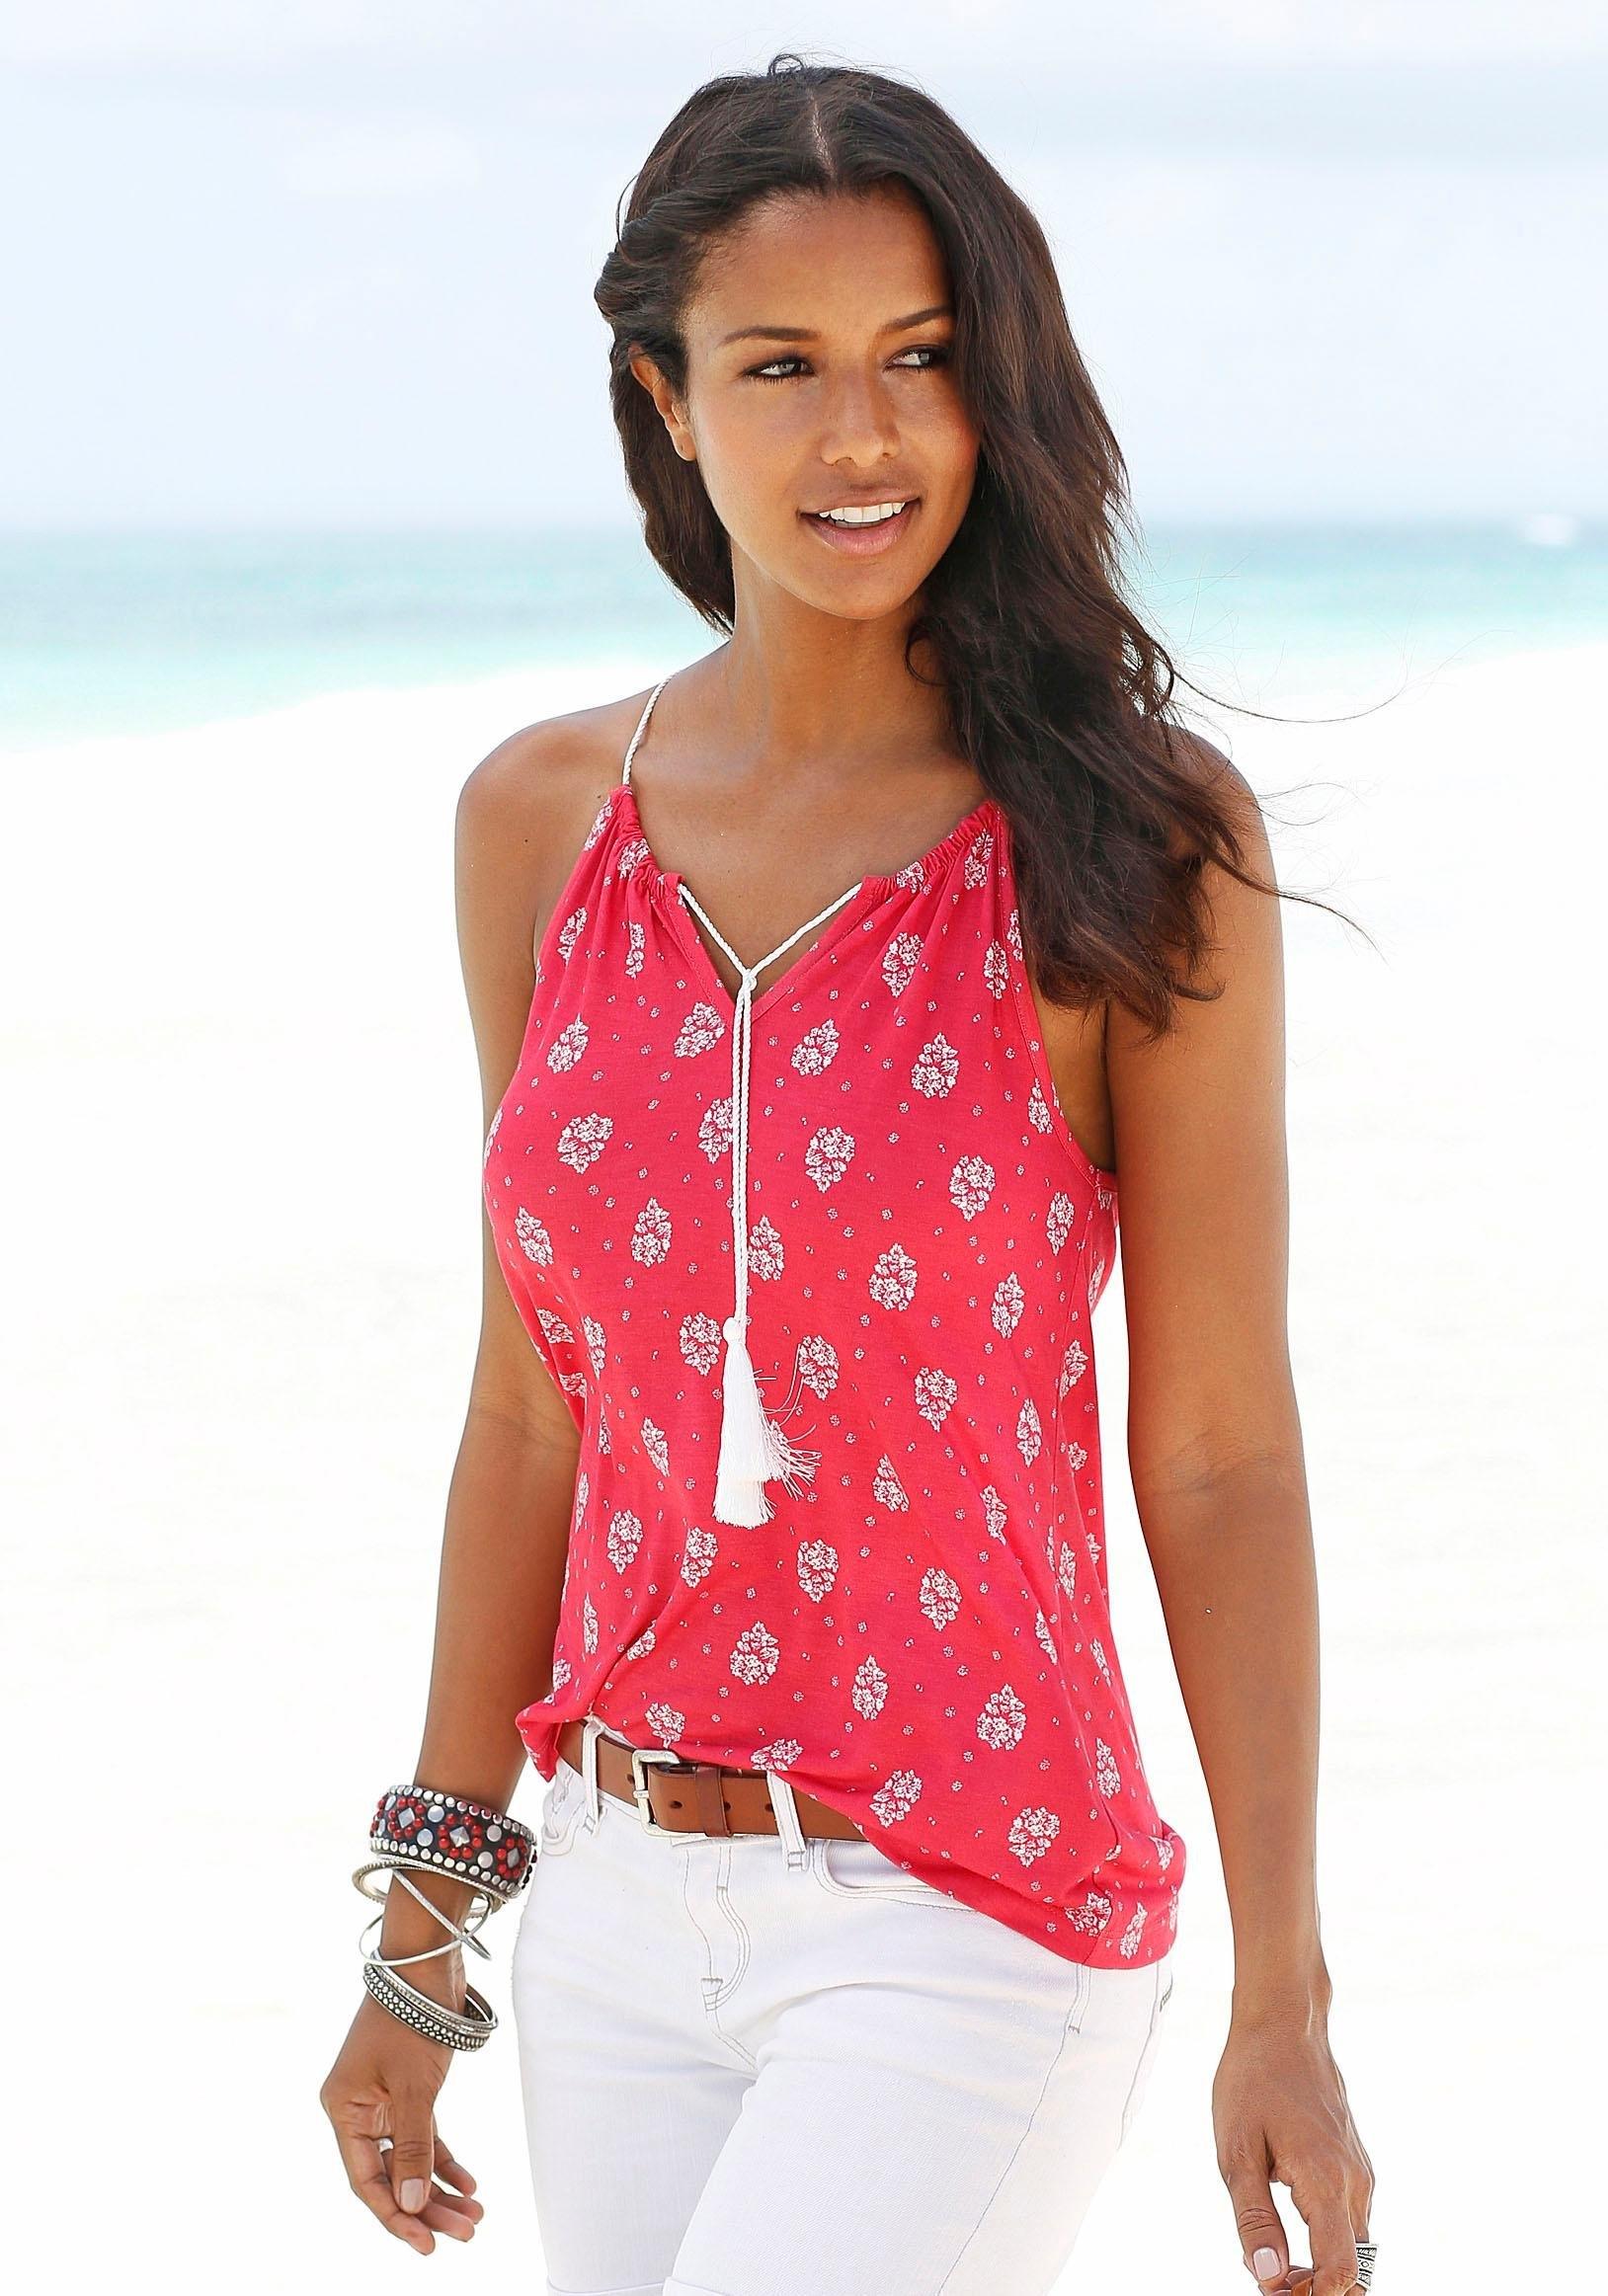 s.Oliver Beachwear S.OLIVER RED LABEL Beachwear strandtop nu online kopen bij OTTO